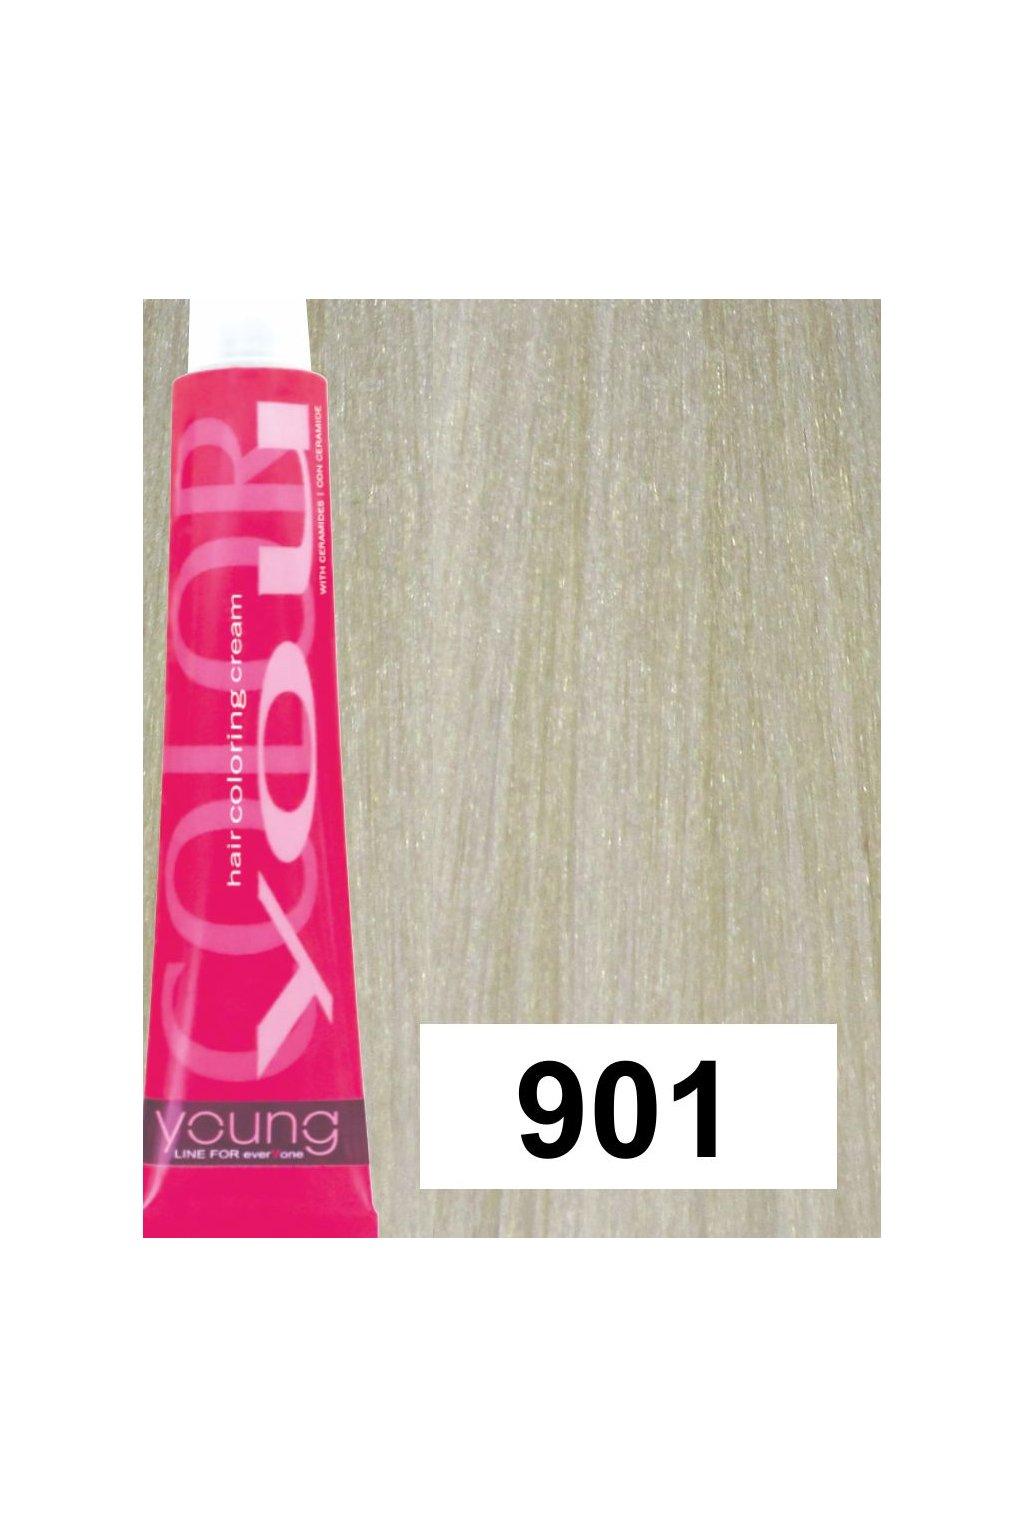 901 yo barva STARA